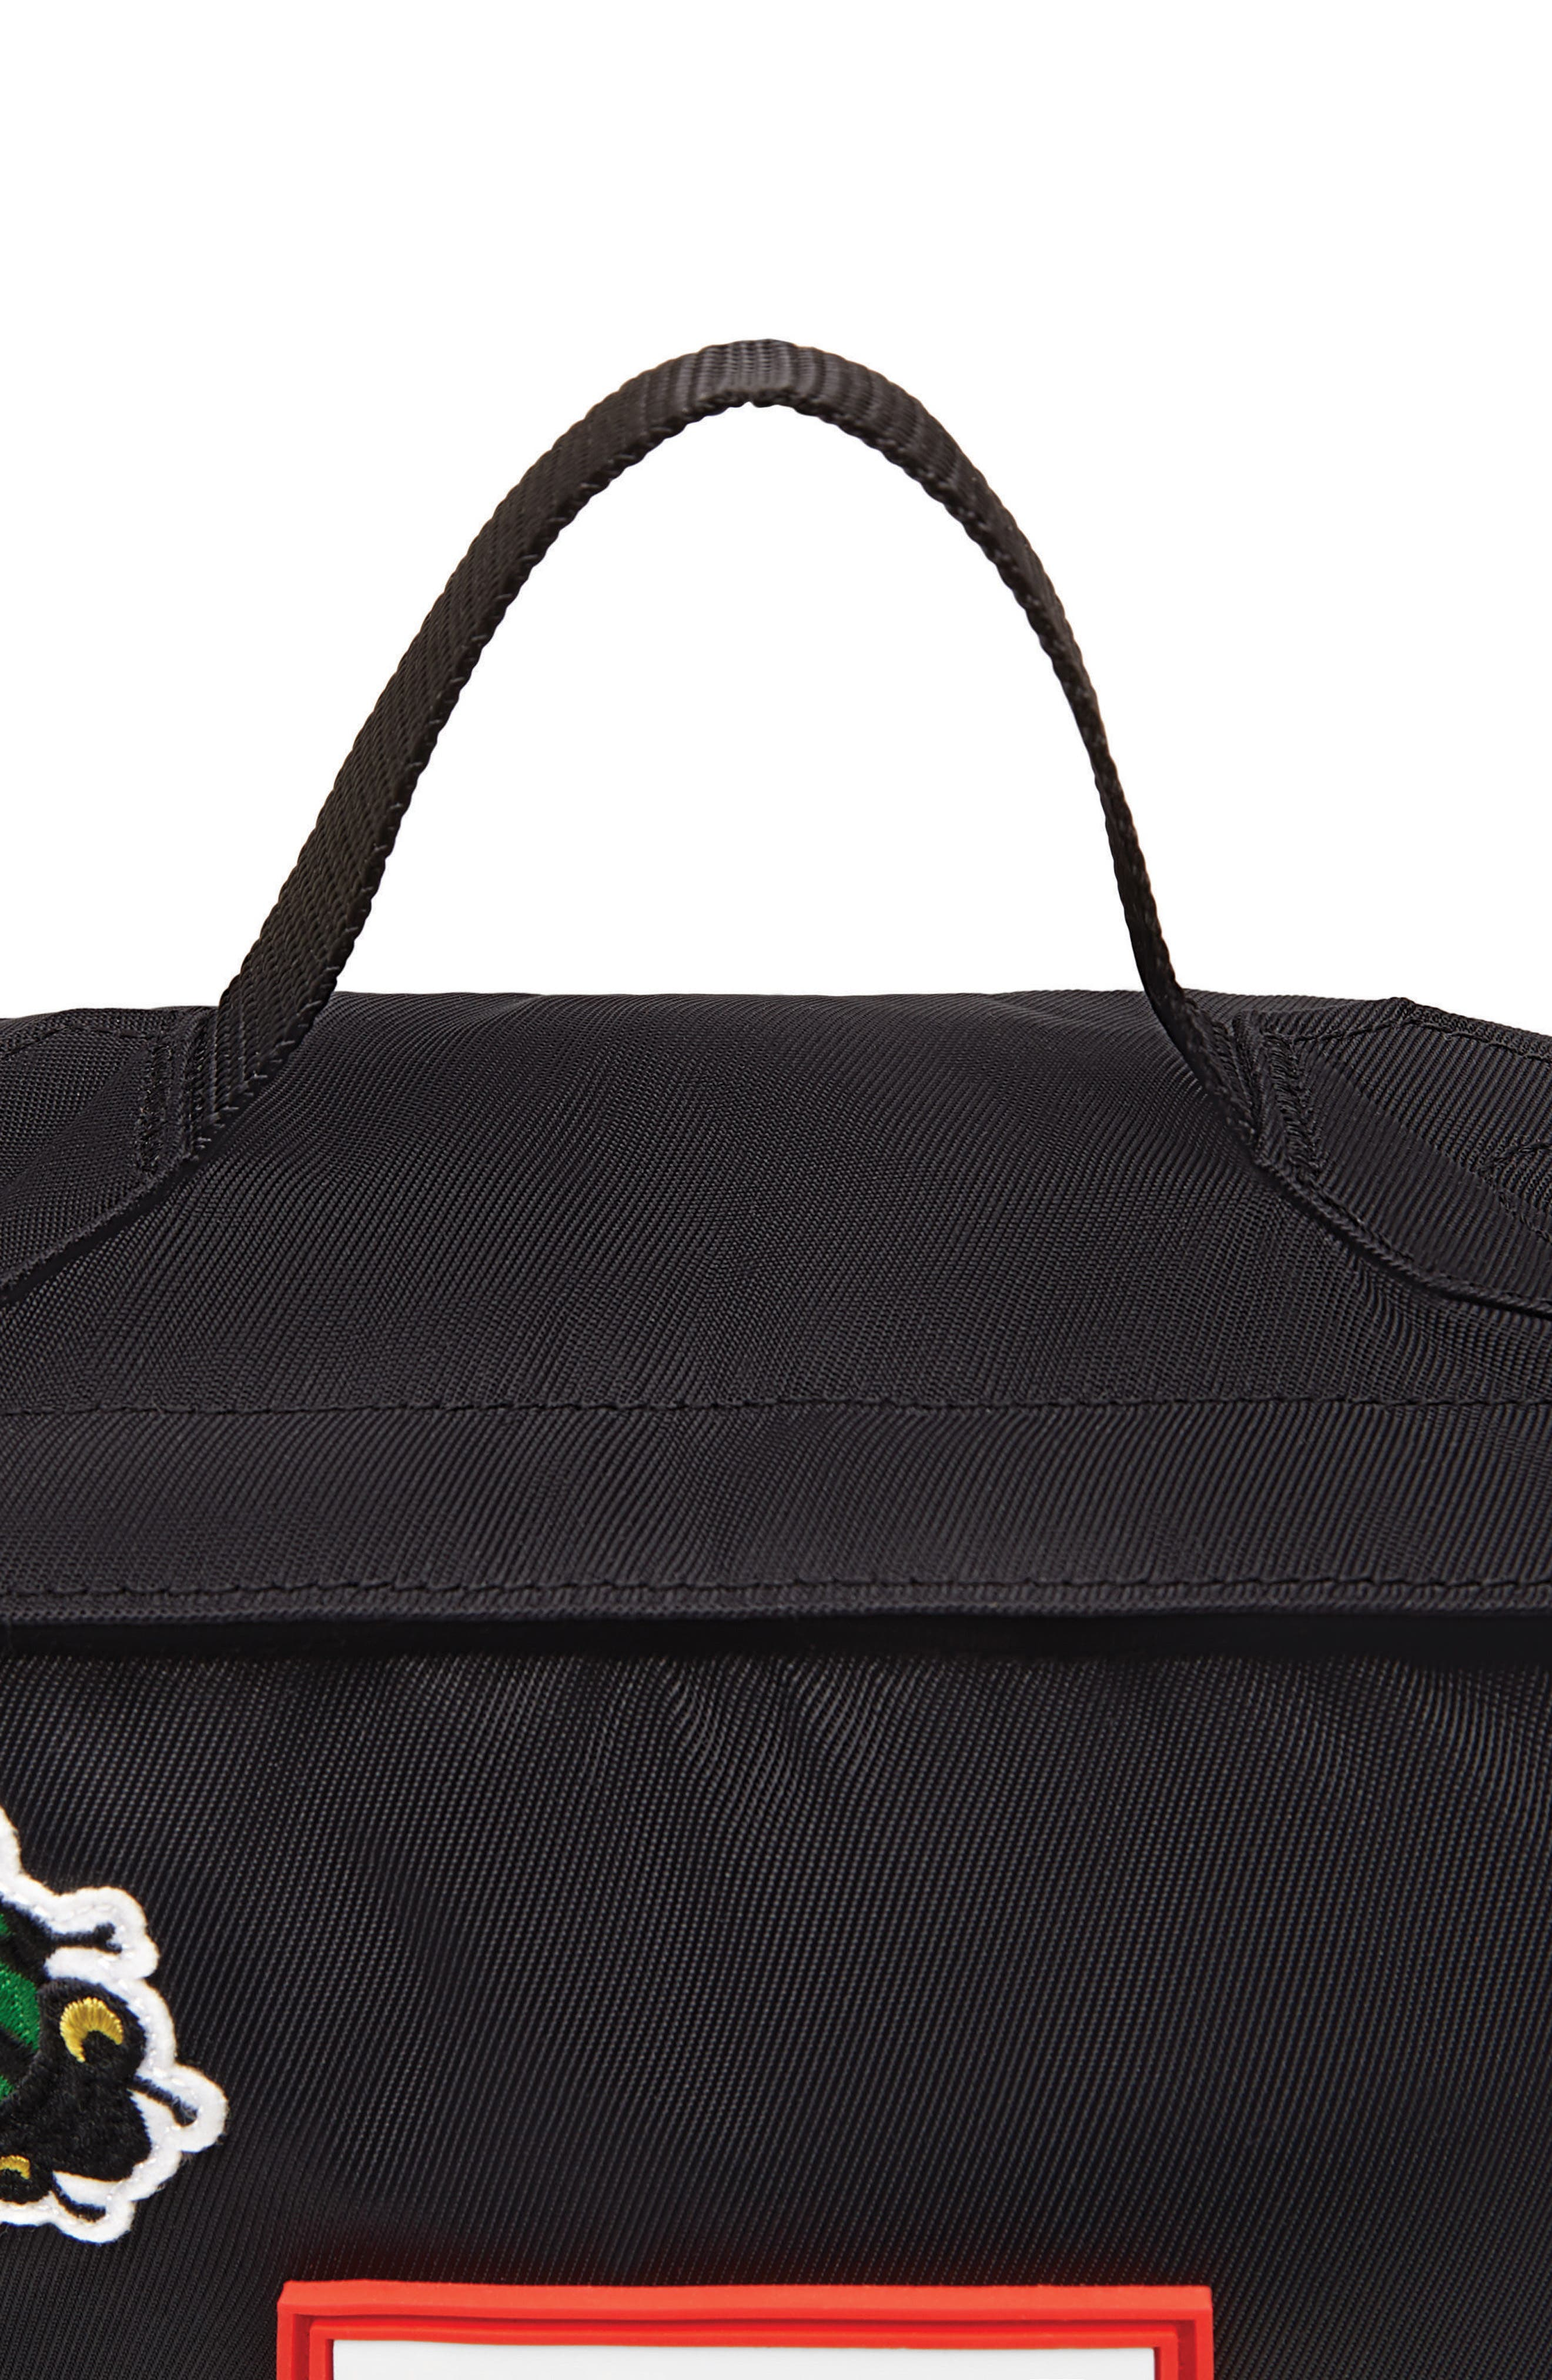 Original Ladybug Water Resistant Backpack,                             Alternate thumbnail 5, color,                             LADYBIRD PRINT